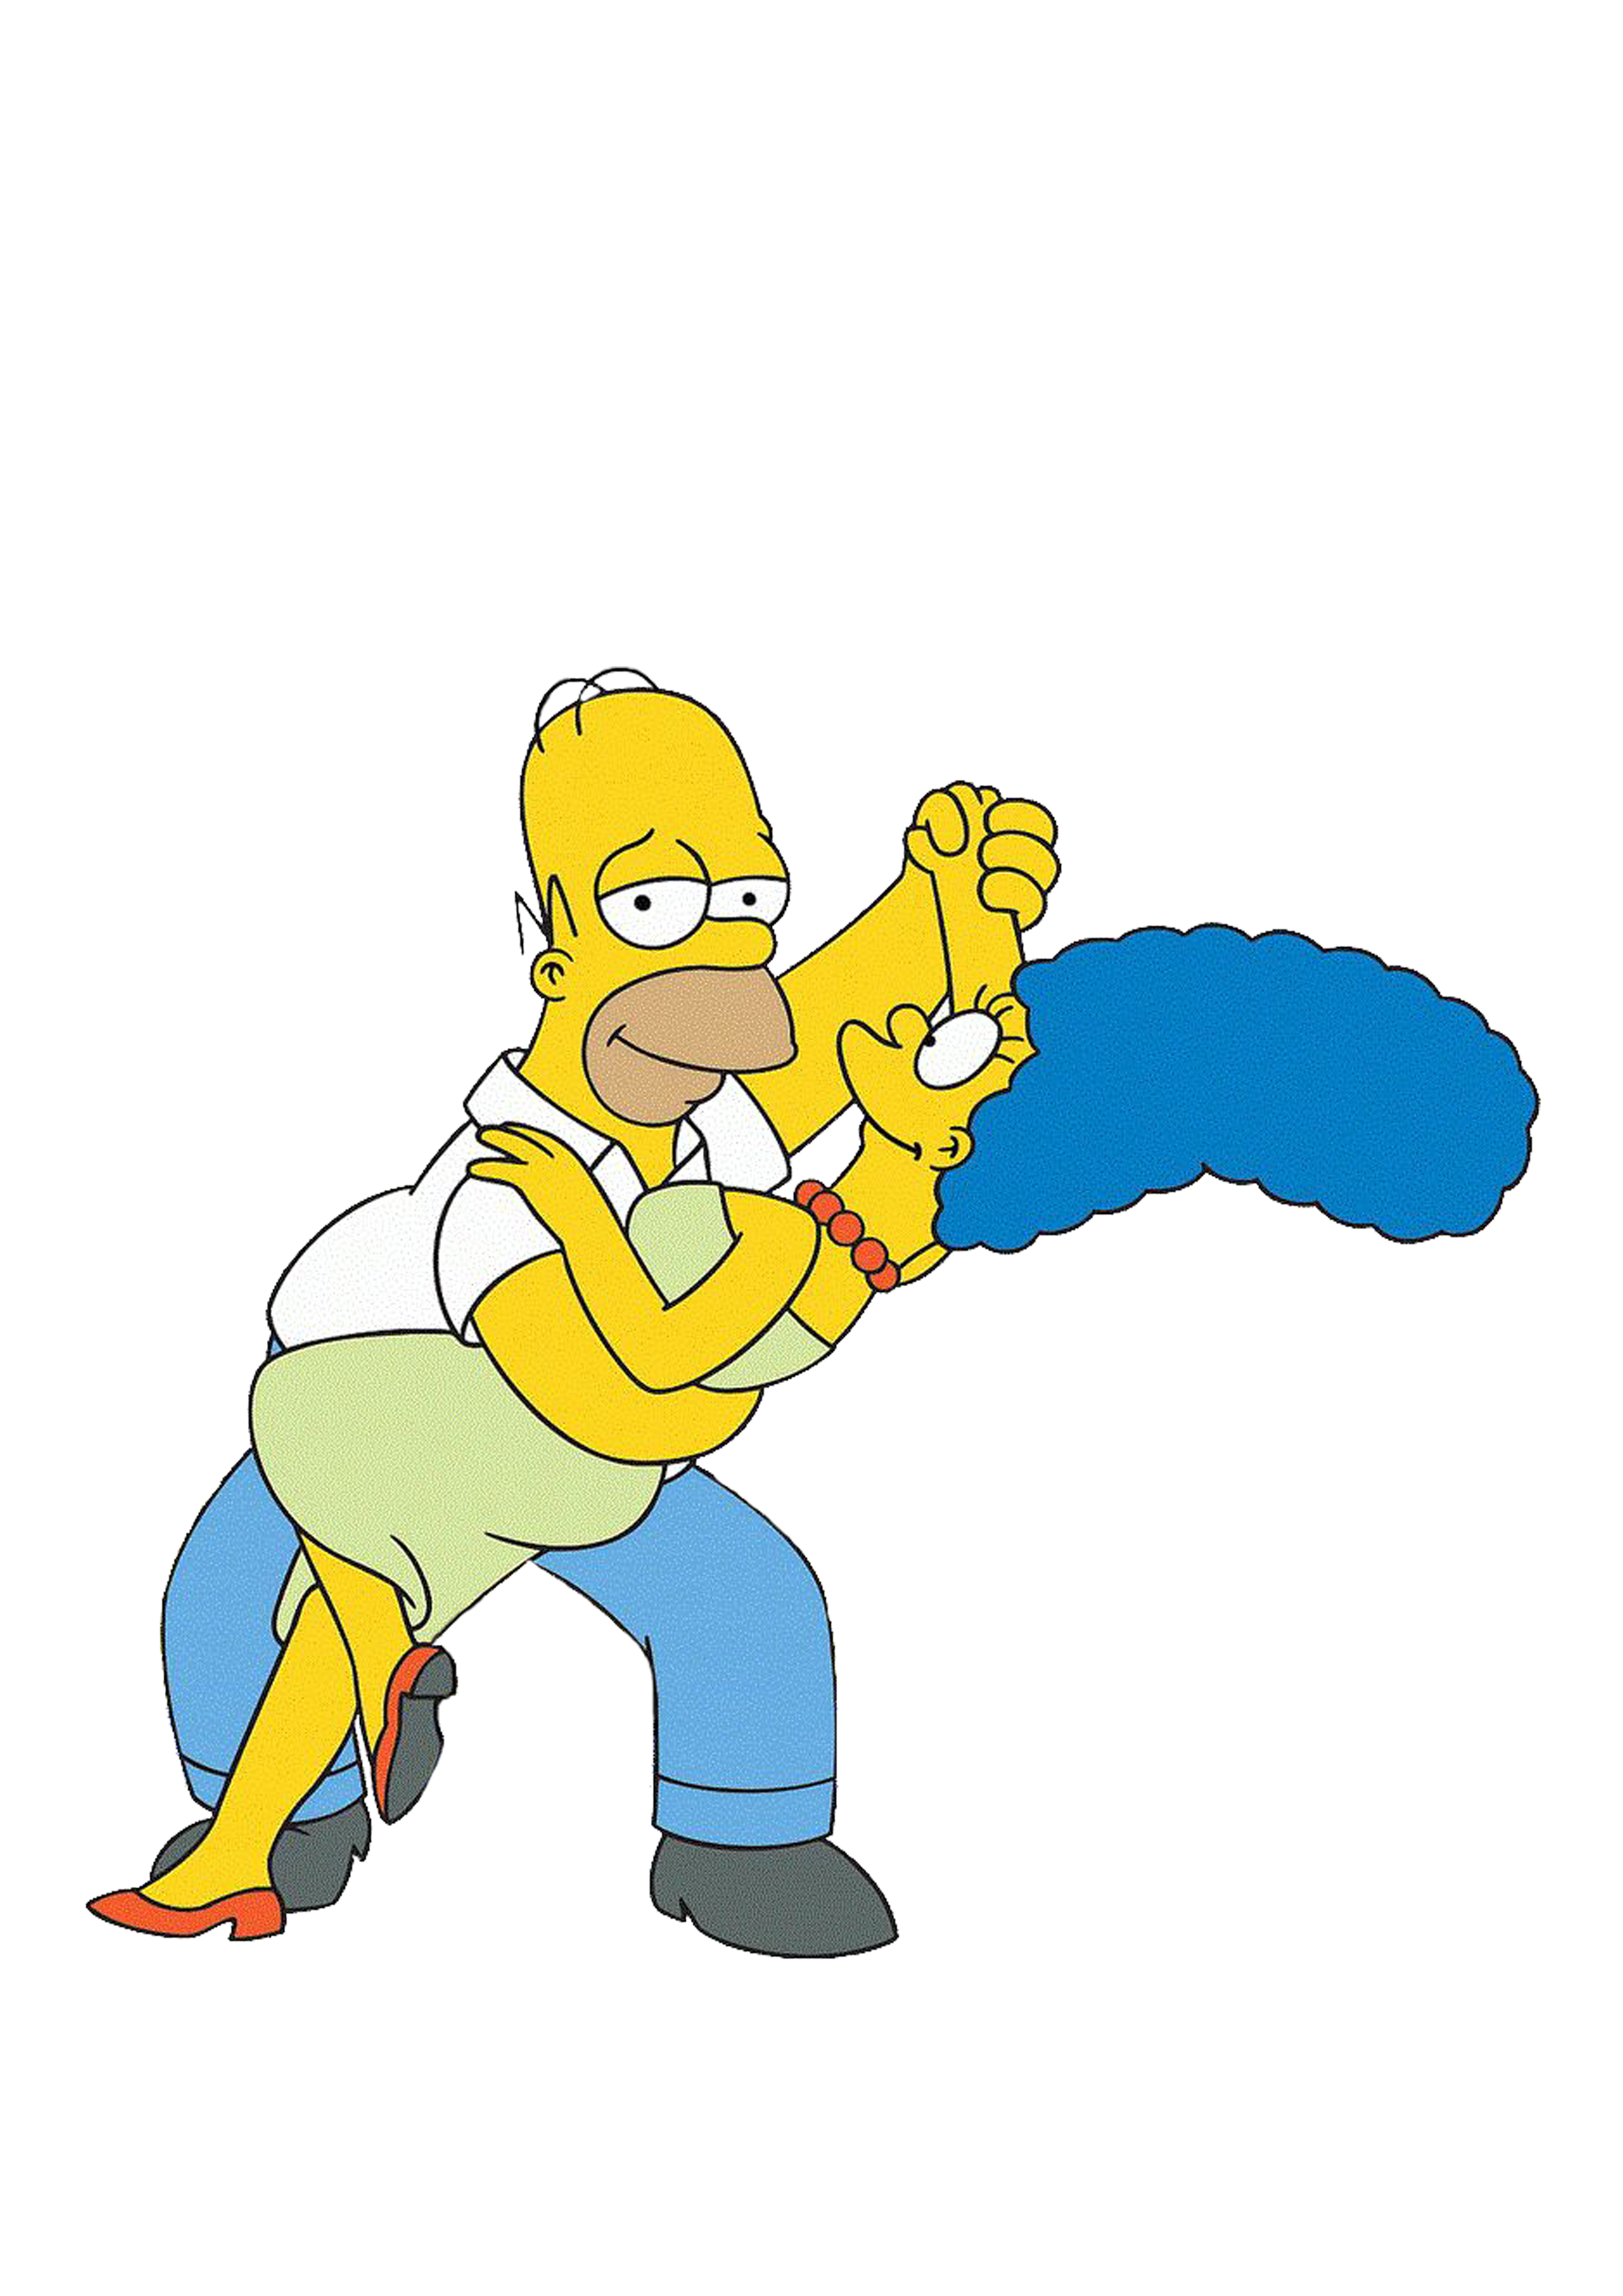 Homer marge simpson 100 binge tv favourites in 2019 homer marge the simpsons bart simpson - Marge simpson et bart ...